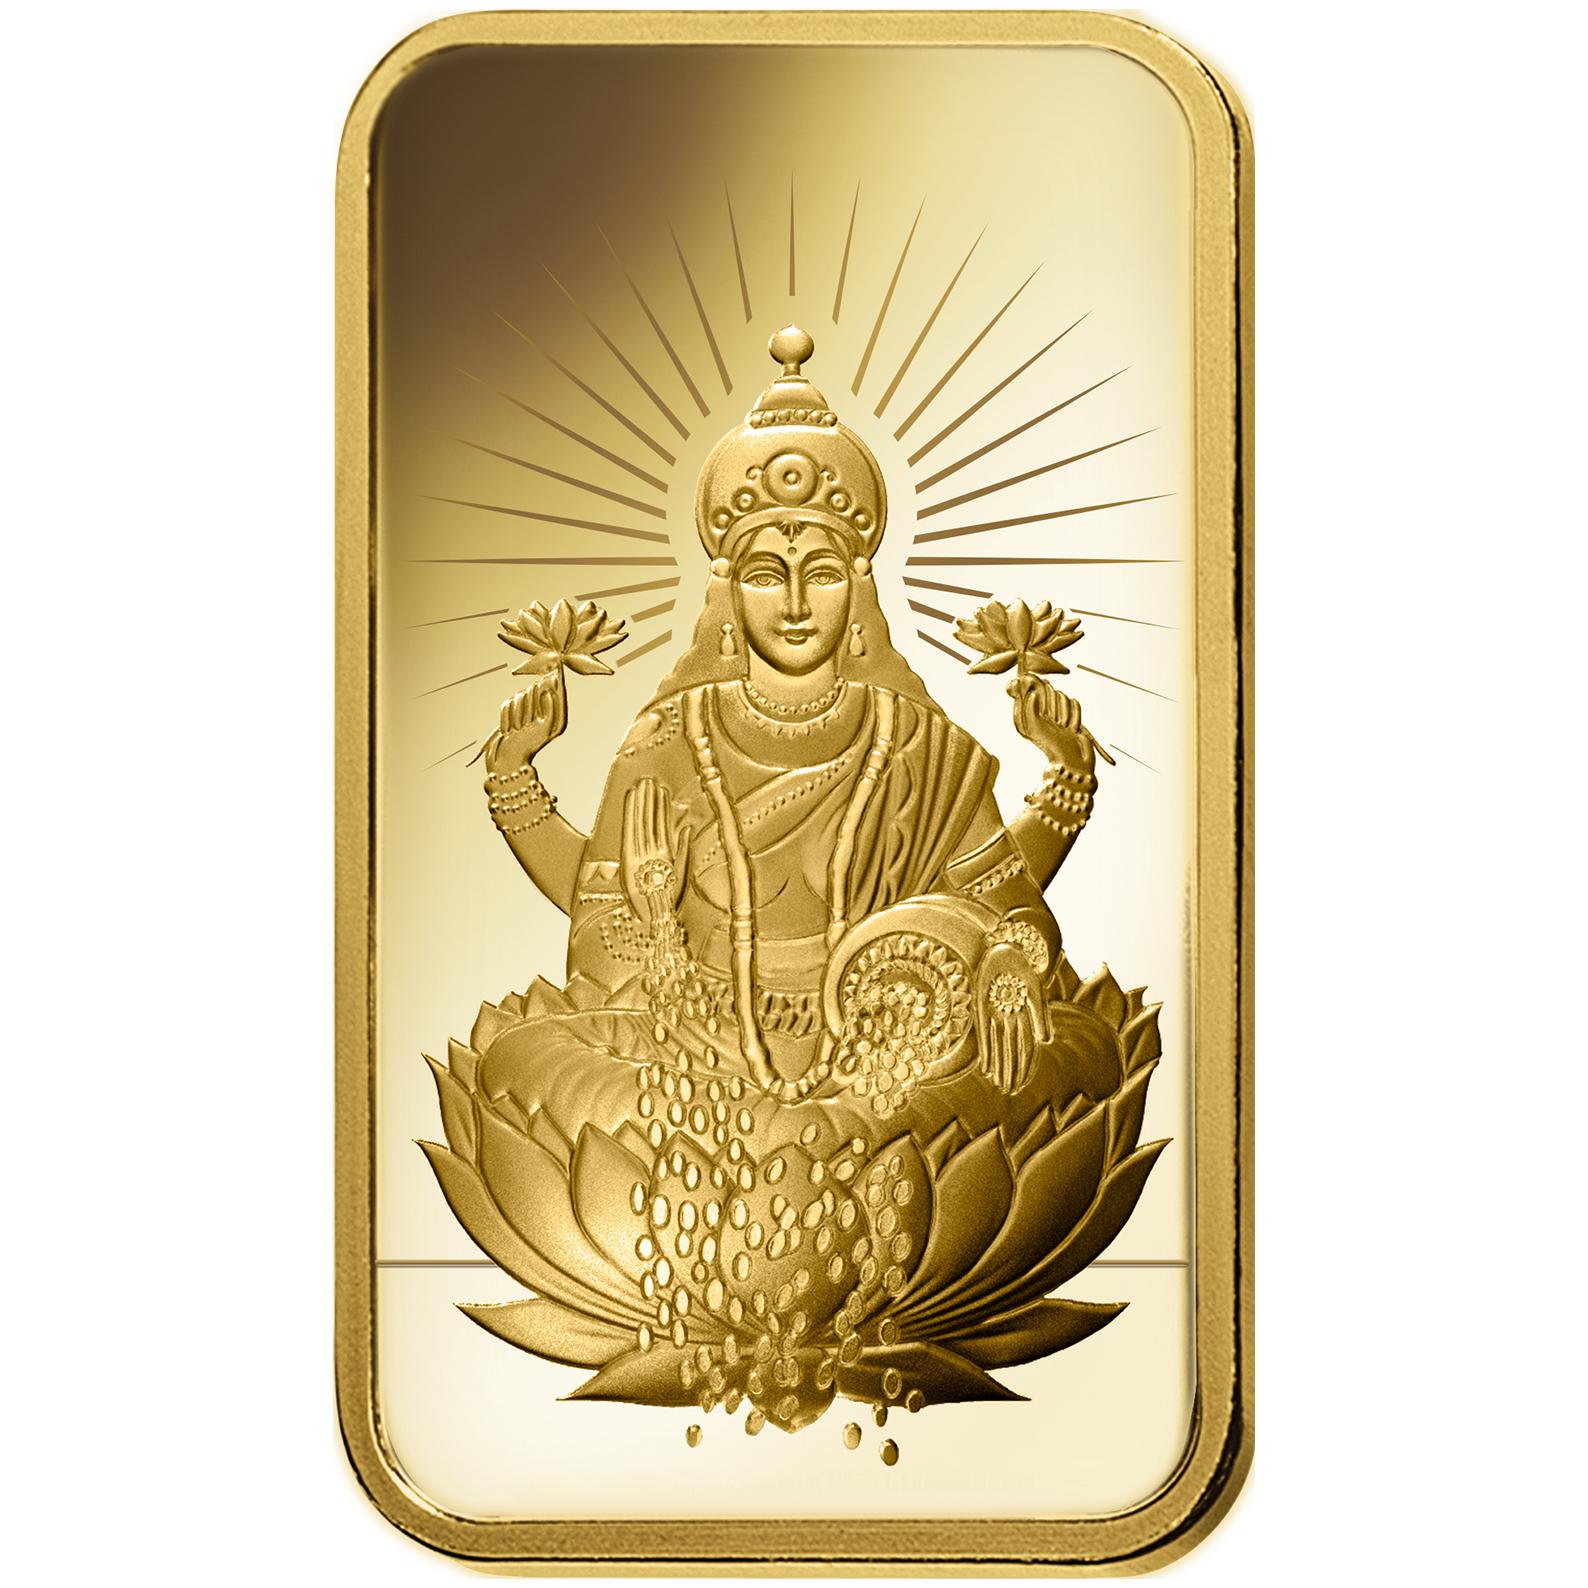 10 grammes lingotin d'or pur 999.9  - PAMP Suisse Lakshmi